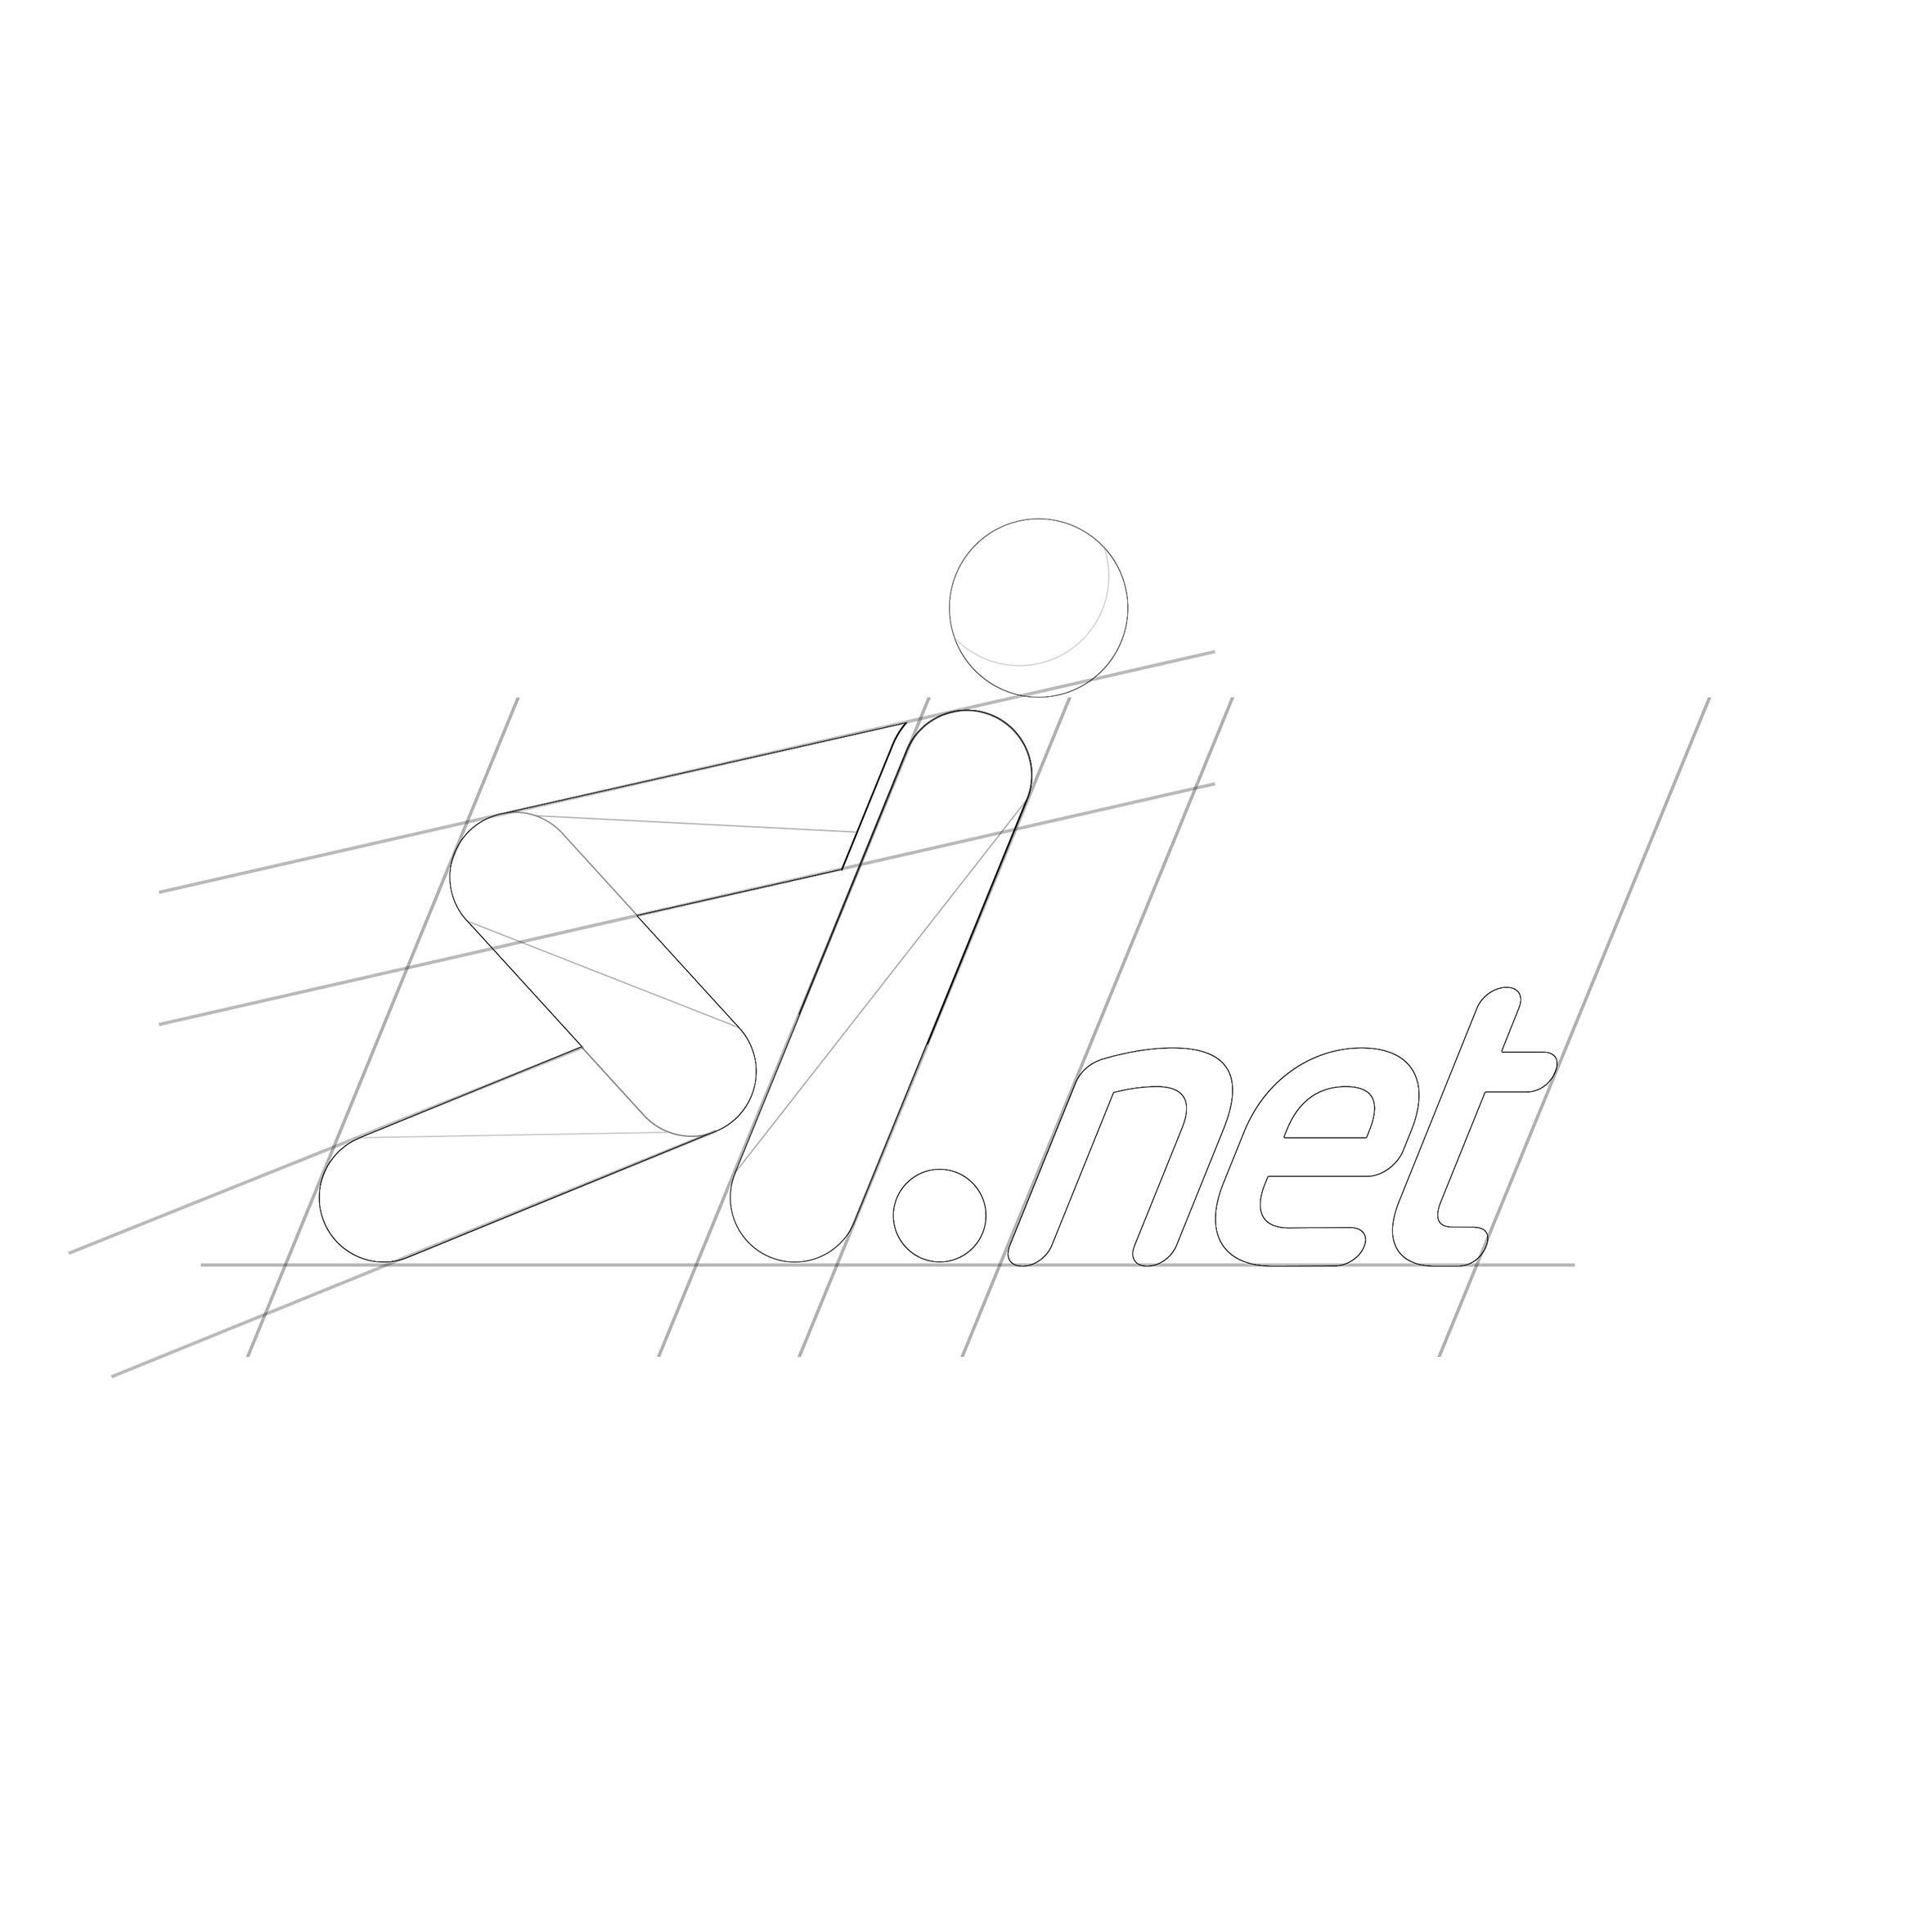 logo sinet_1bianco